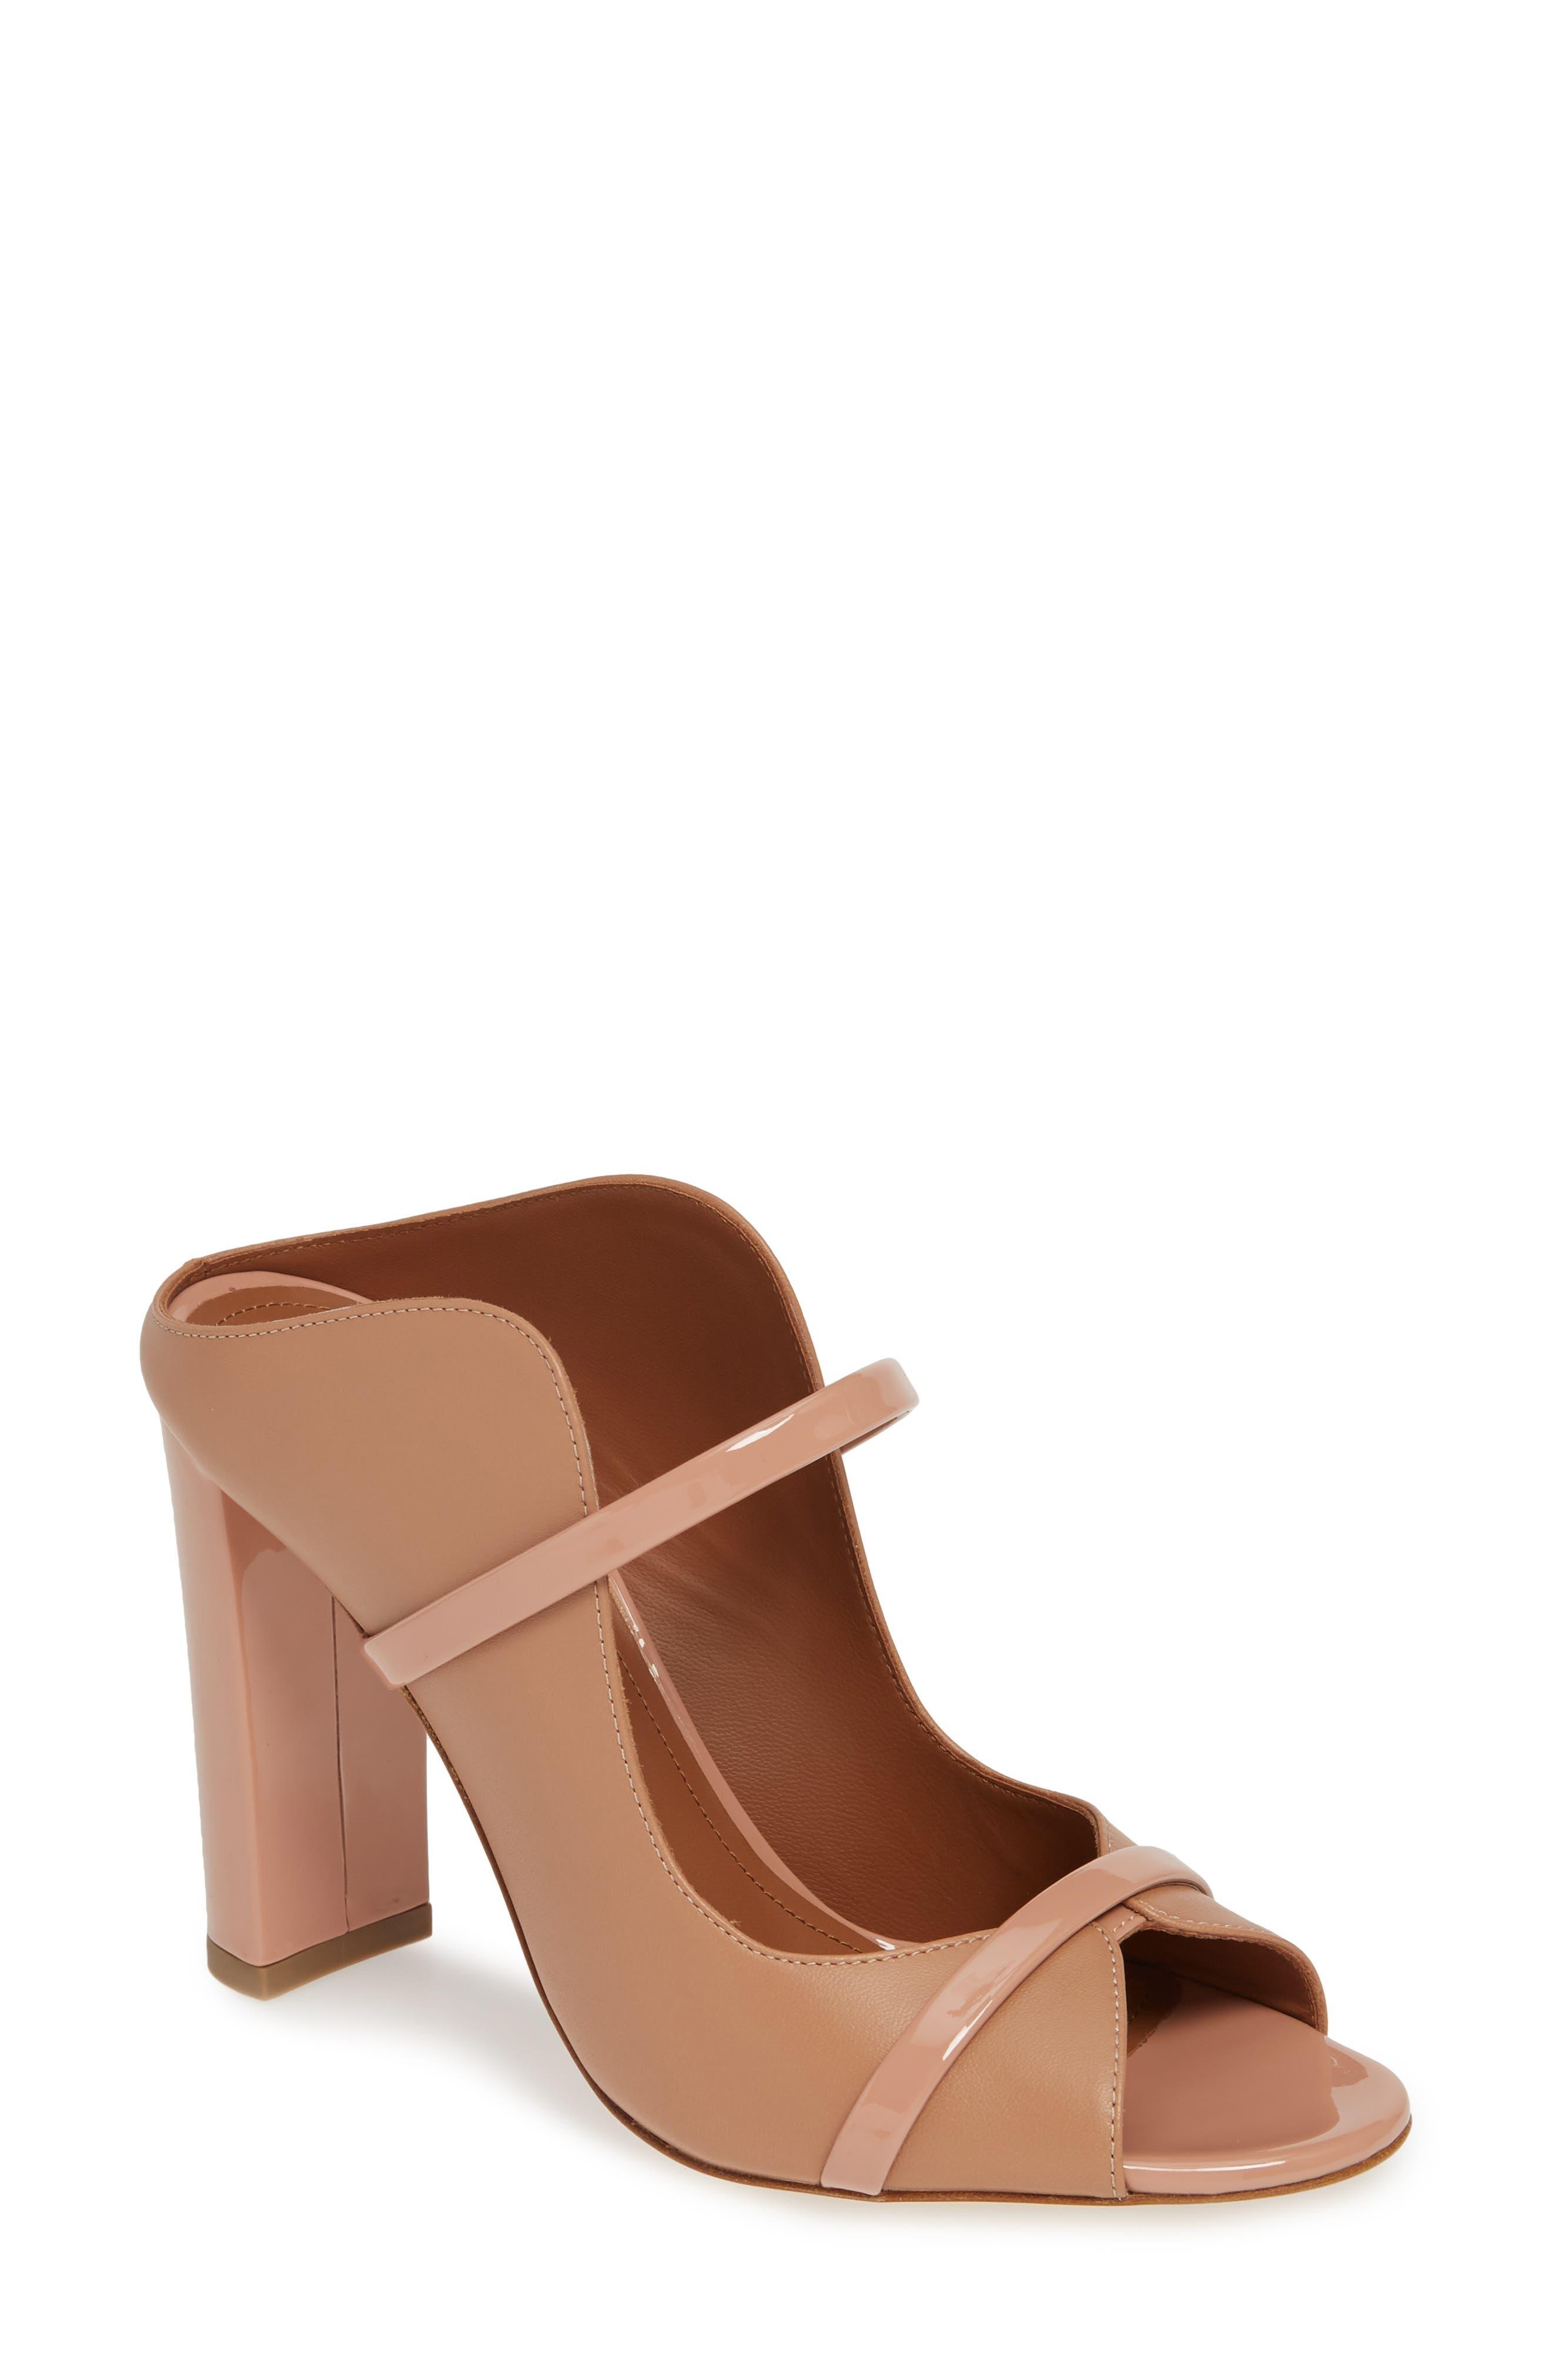 MALONE SOULIERS Norah Block Heel Sandal, Main, color, NUDE/ BLUSH